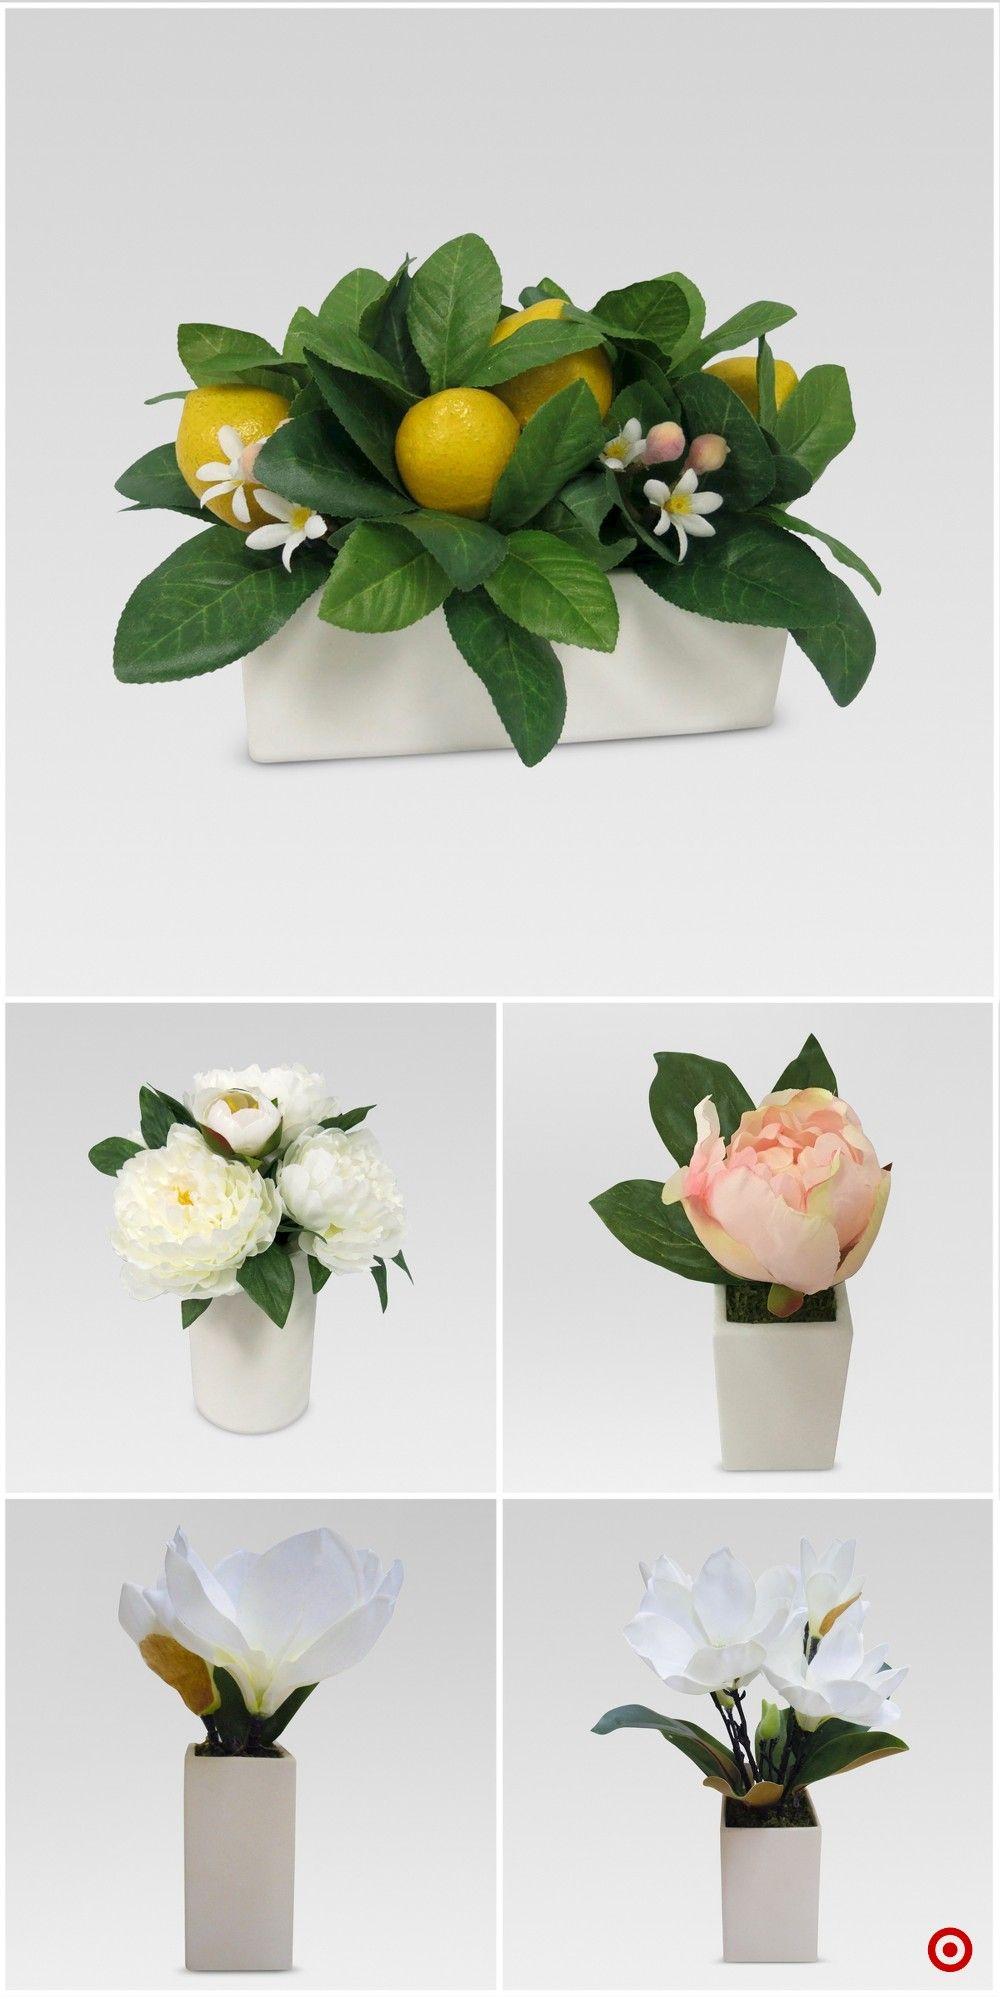 Shop Target For Artificial Arrangement You Will Love At Great Low Prices Fre Floral Arrangements Diy Flower Centerpieces Wedding Flower Arrangements